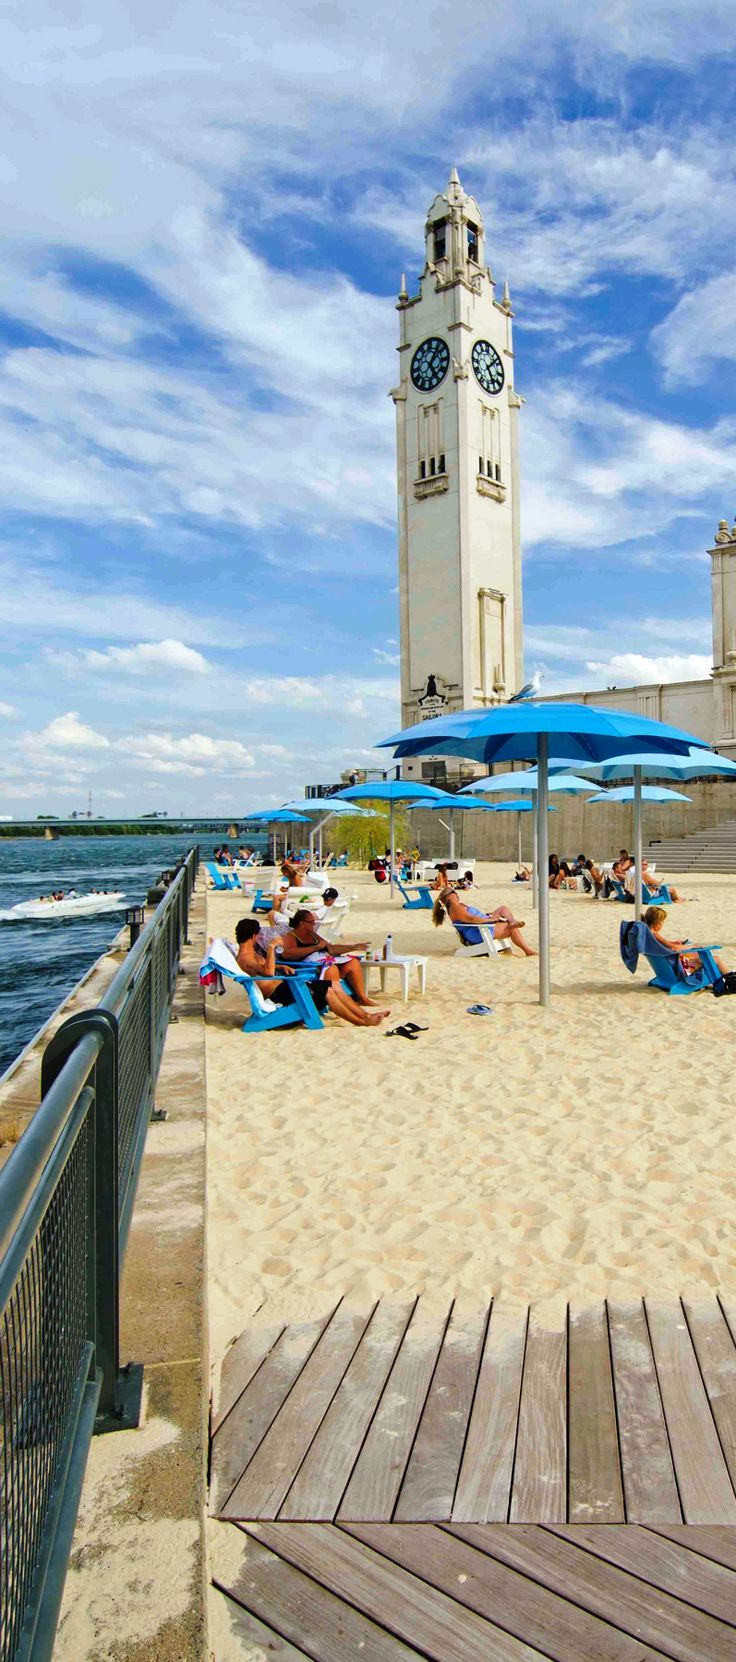 Clock Tower Beach Montreal, Canada